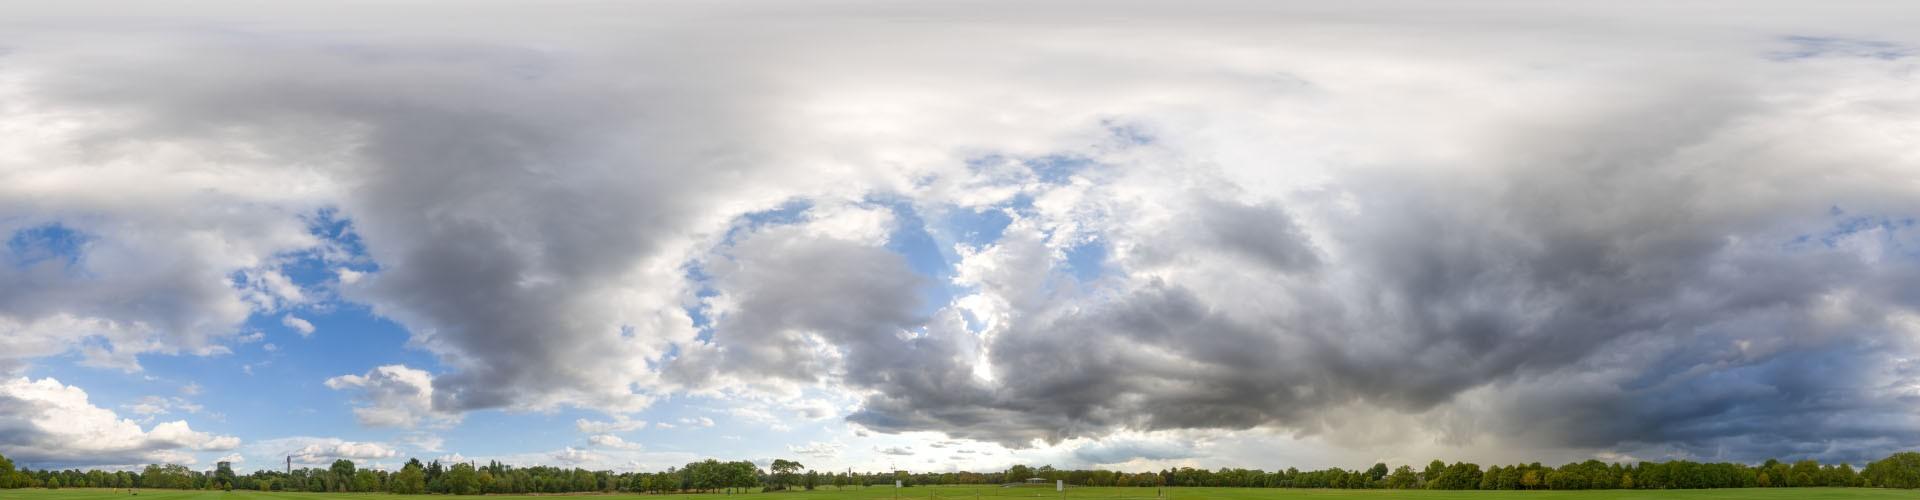 Rainy Clouds 2478 (30k) HDRI